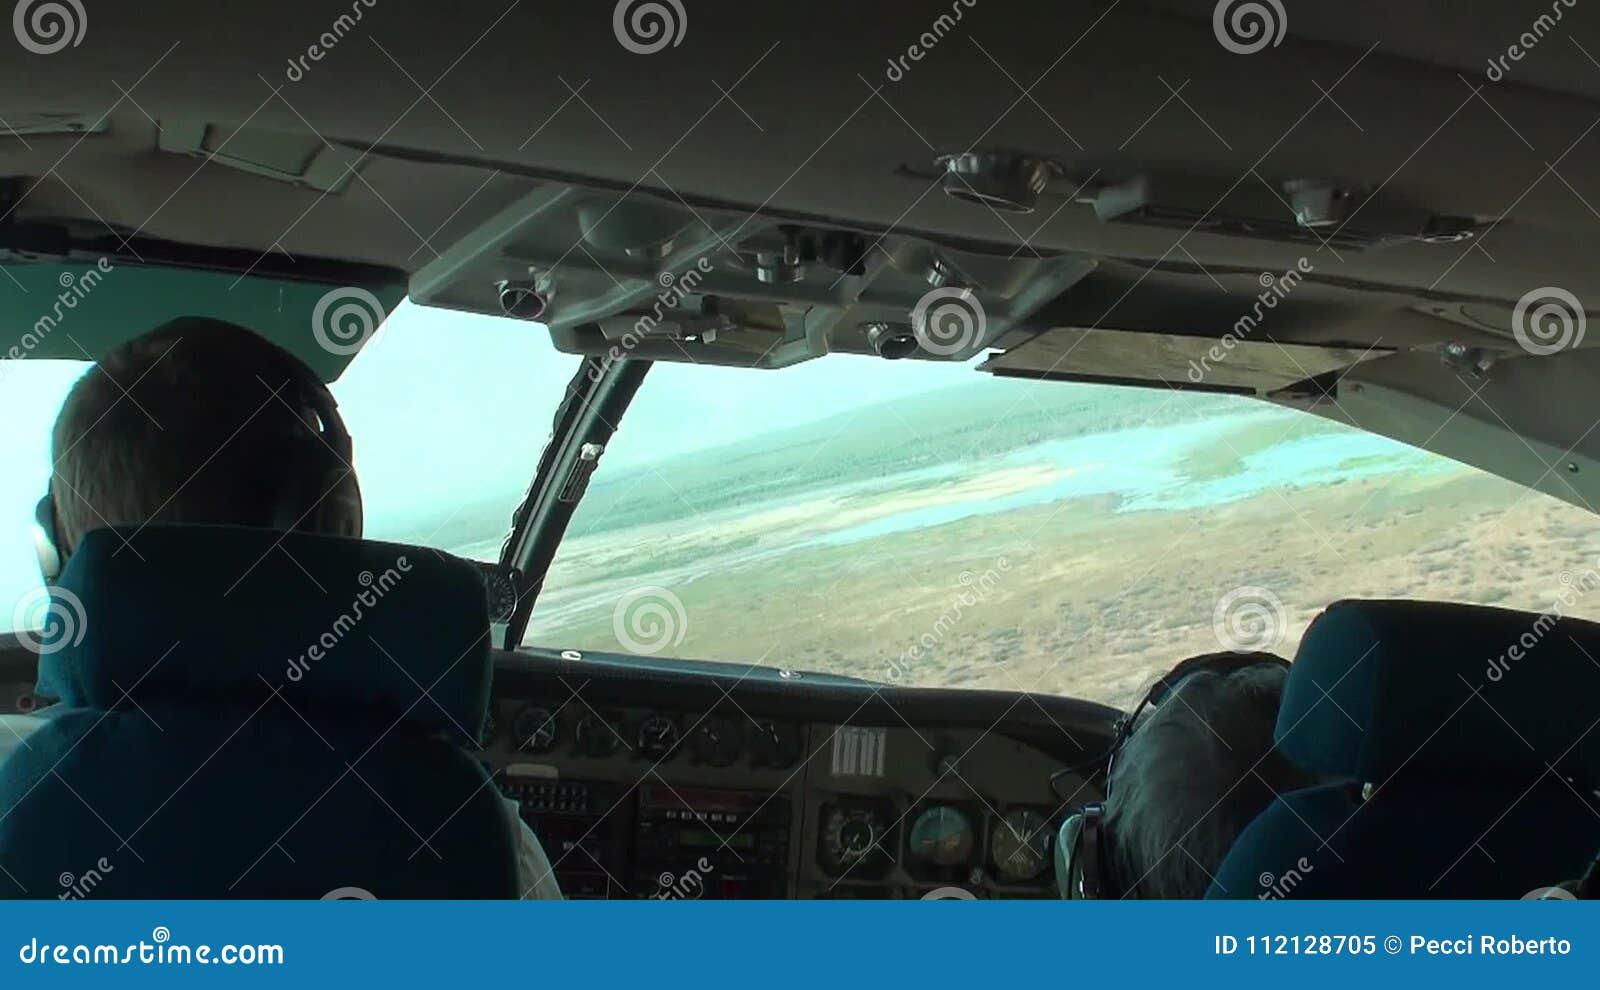 https://thumbs.dreamstime.com/z/australie-parc-national-de-kakadu-vol-au-dessus-du-naturel-tir-pris-l-int%C3%A9rieur-la-cabine-d-a%C3%A9ronefs-vue-panorama-112128705.jpg